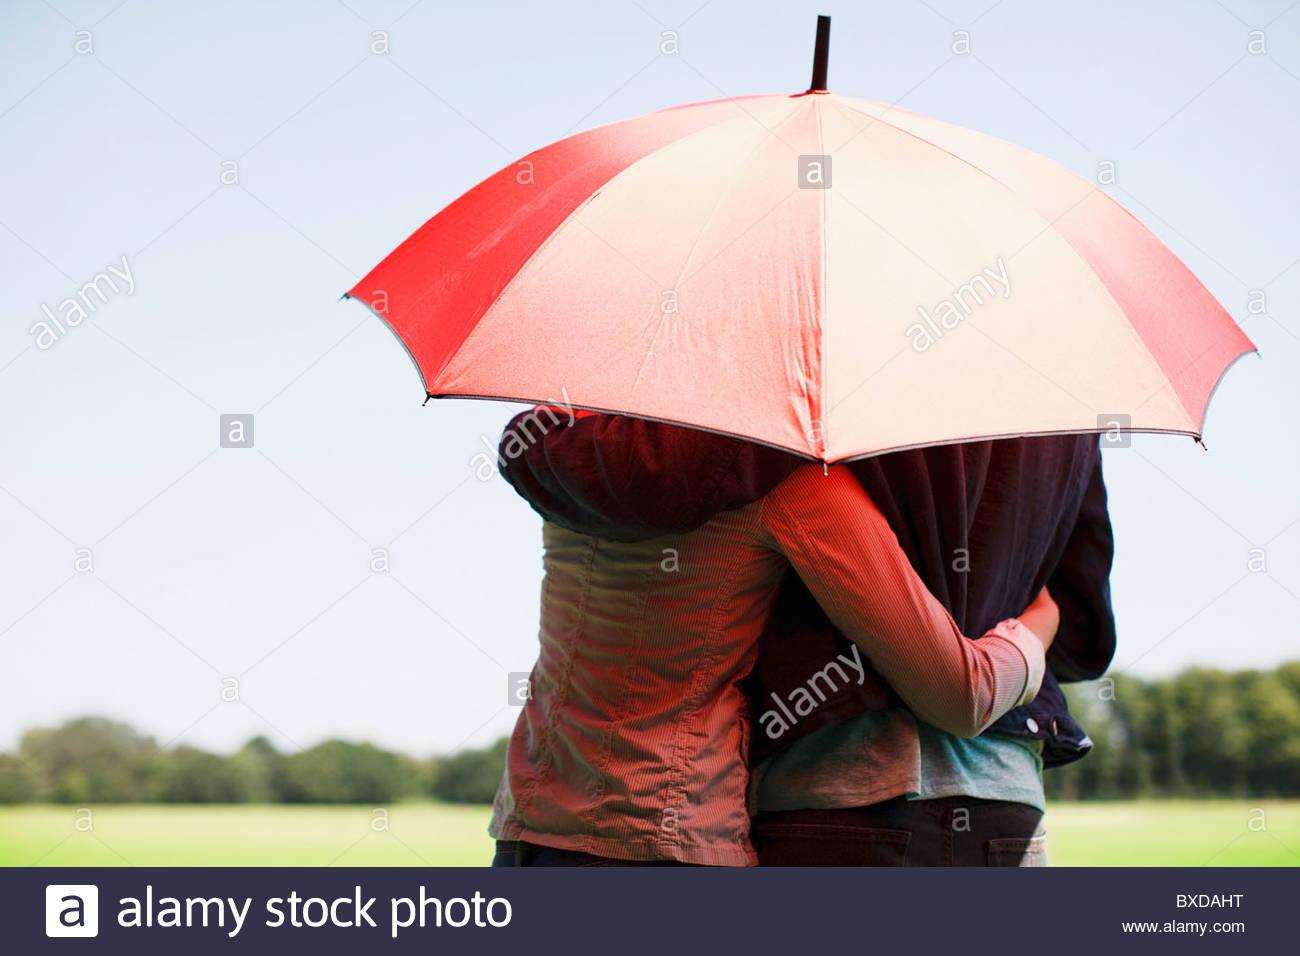 Pareja abrazarse bajo la sombrilla roja Imagen De Stock